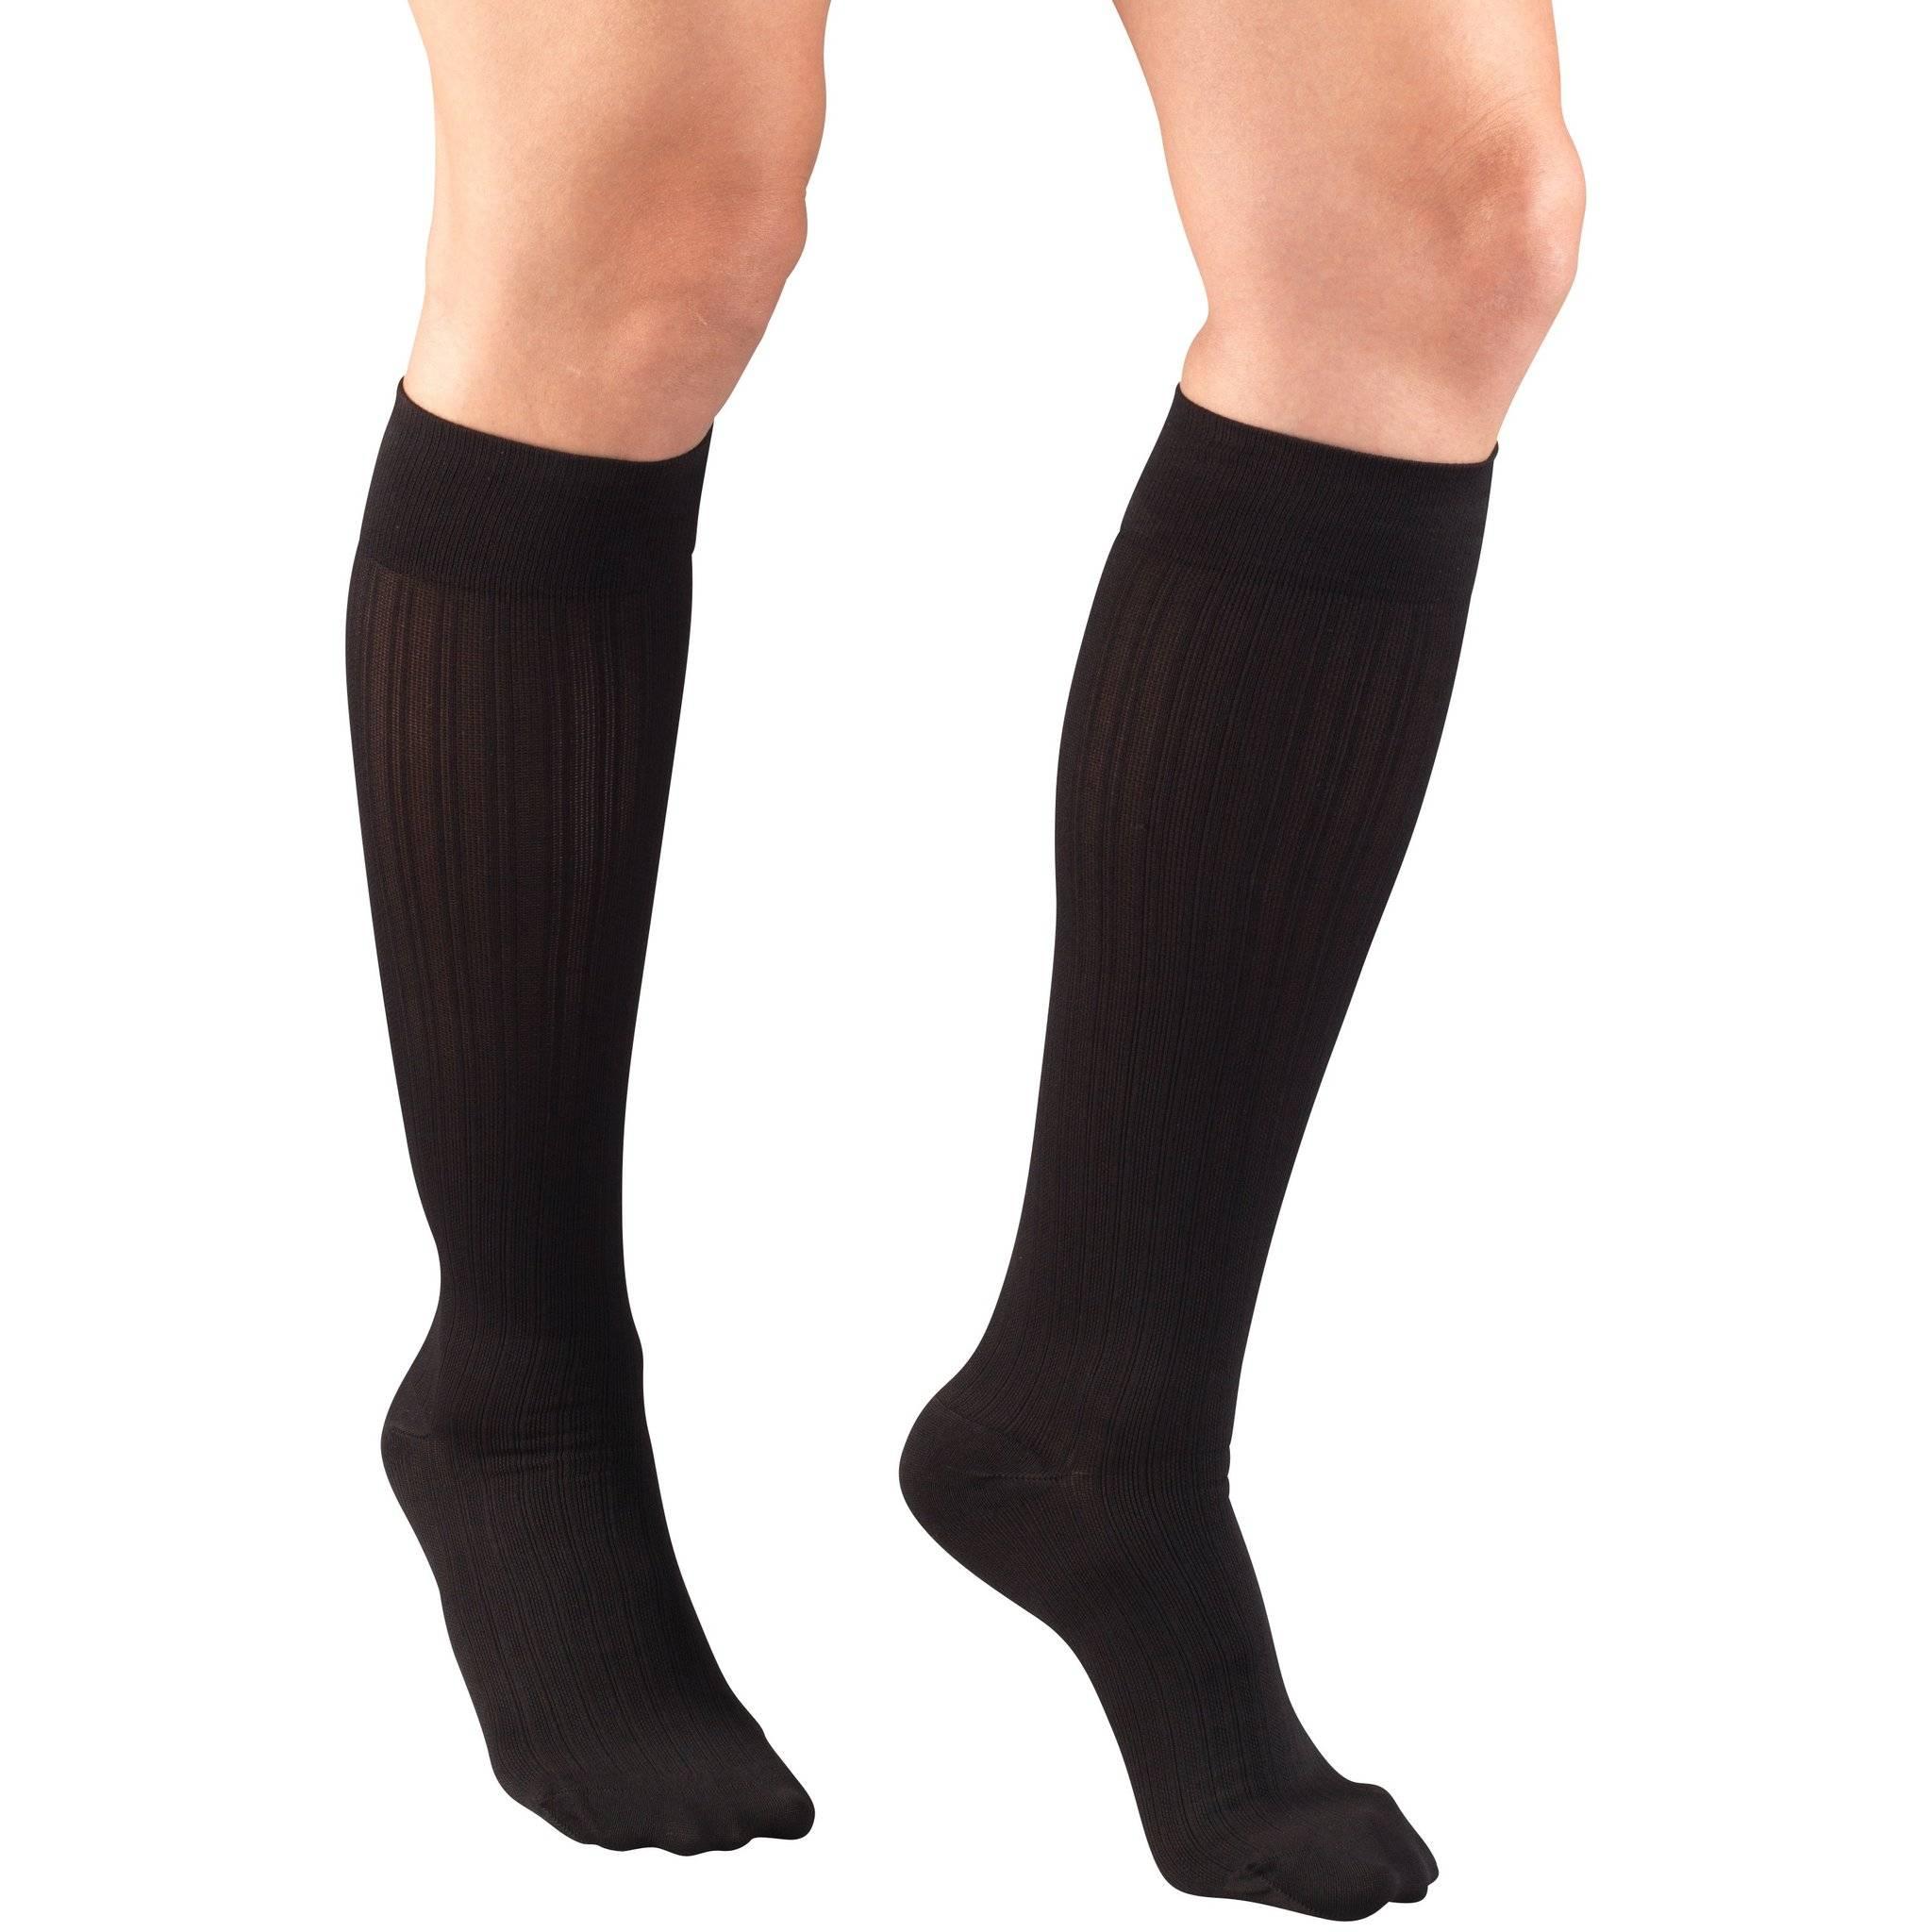 Ladies' Knee High Rib Pattern Socks